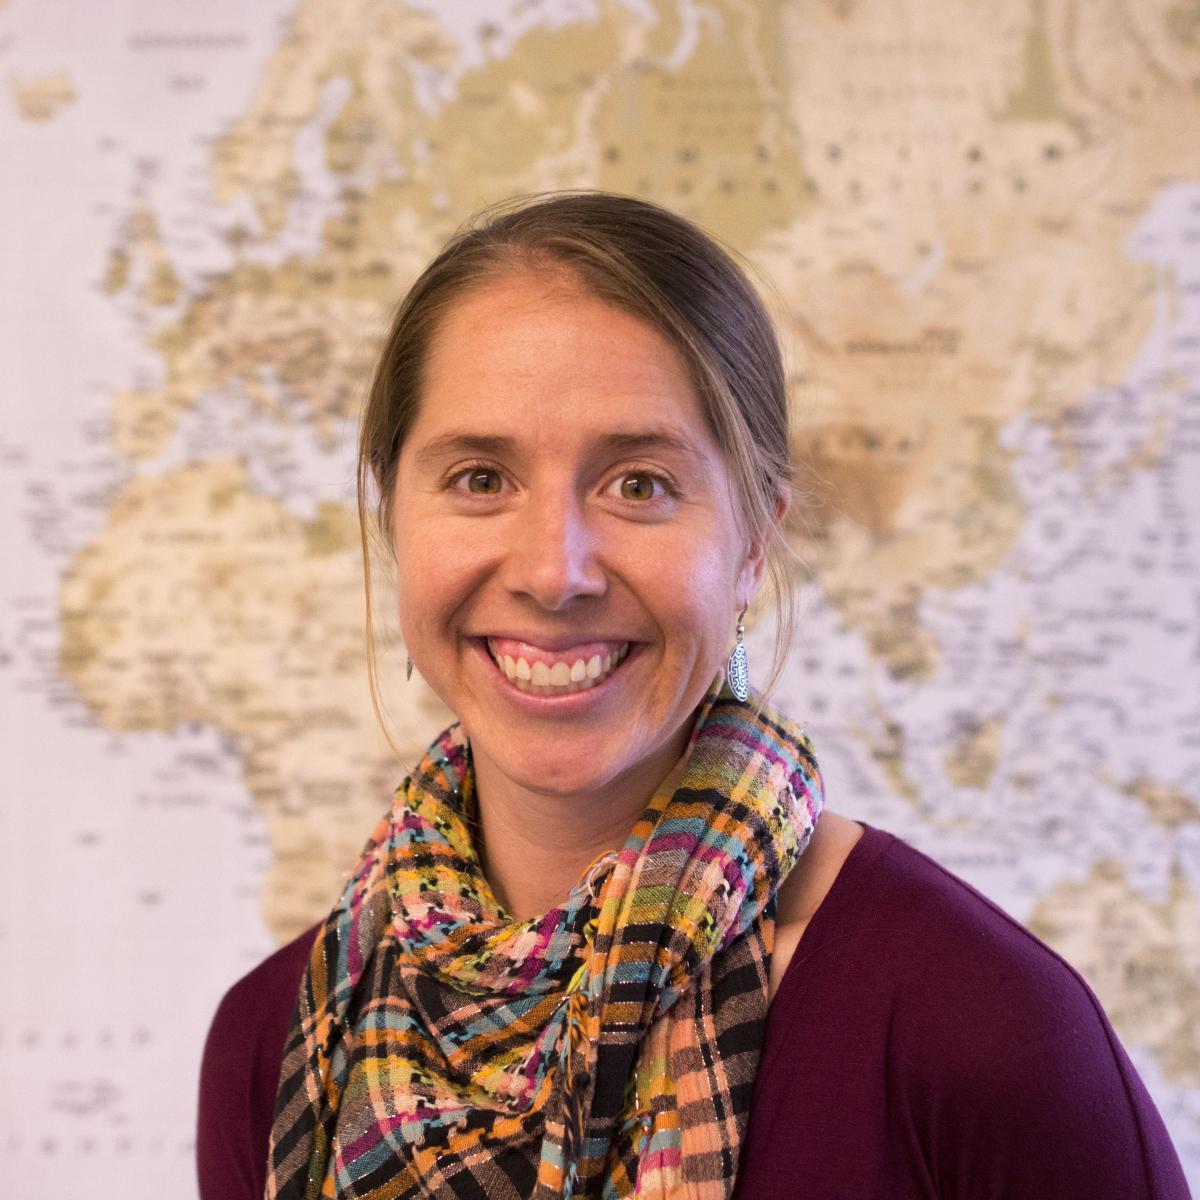 Deanna Tollefson, University of Washington Department of Global Health